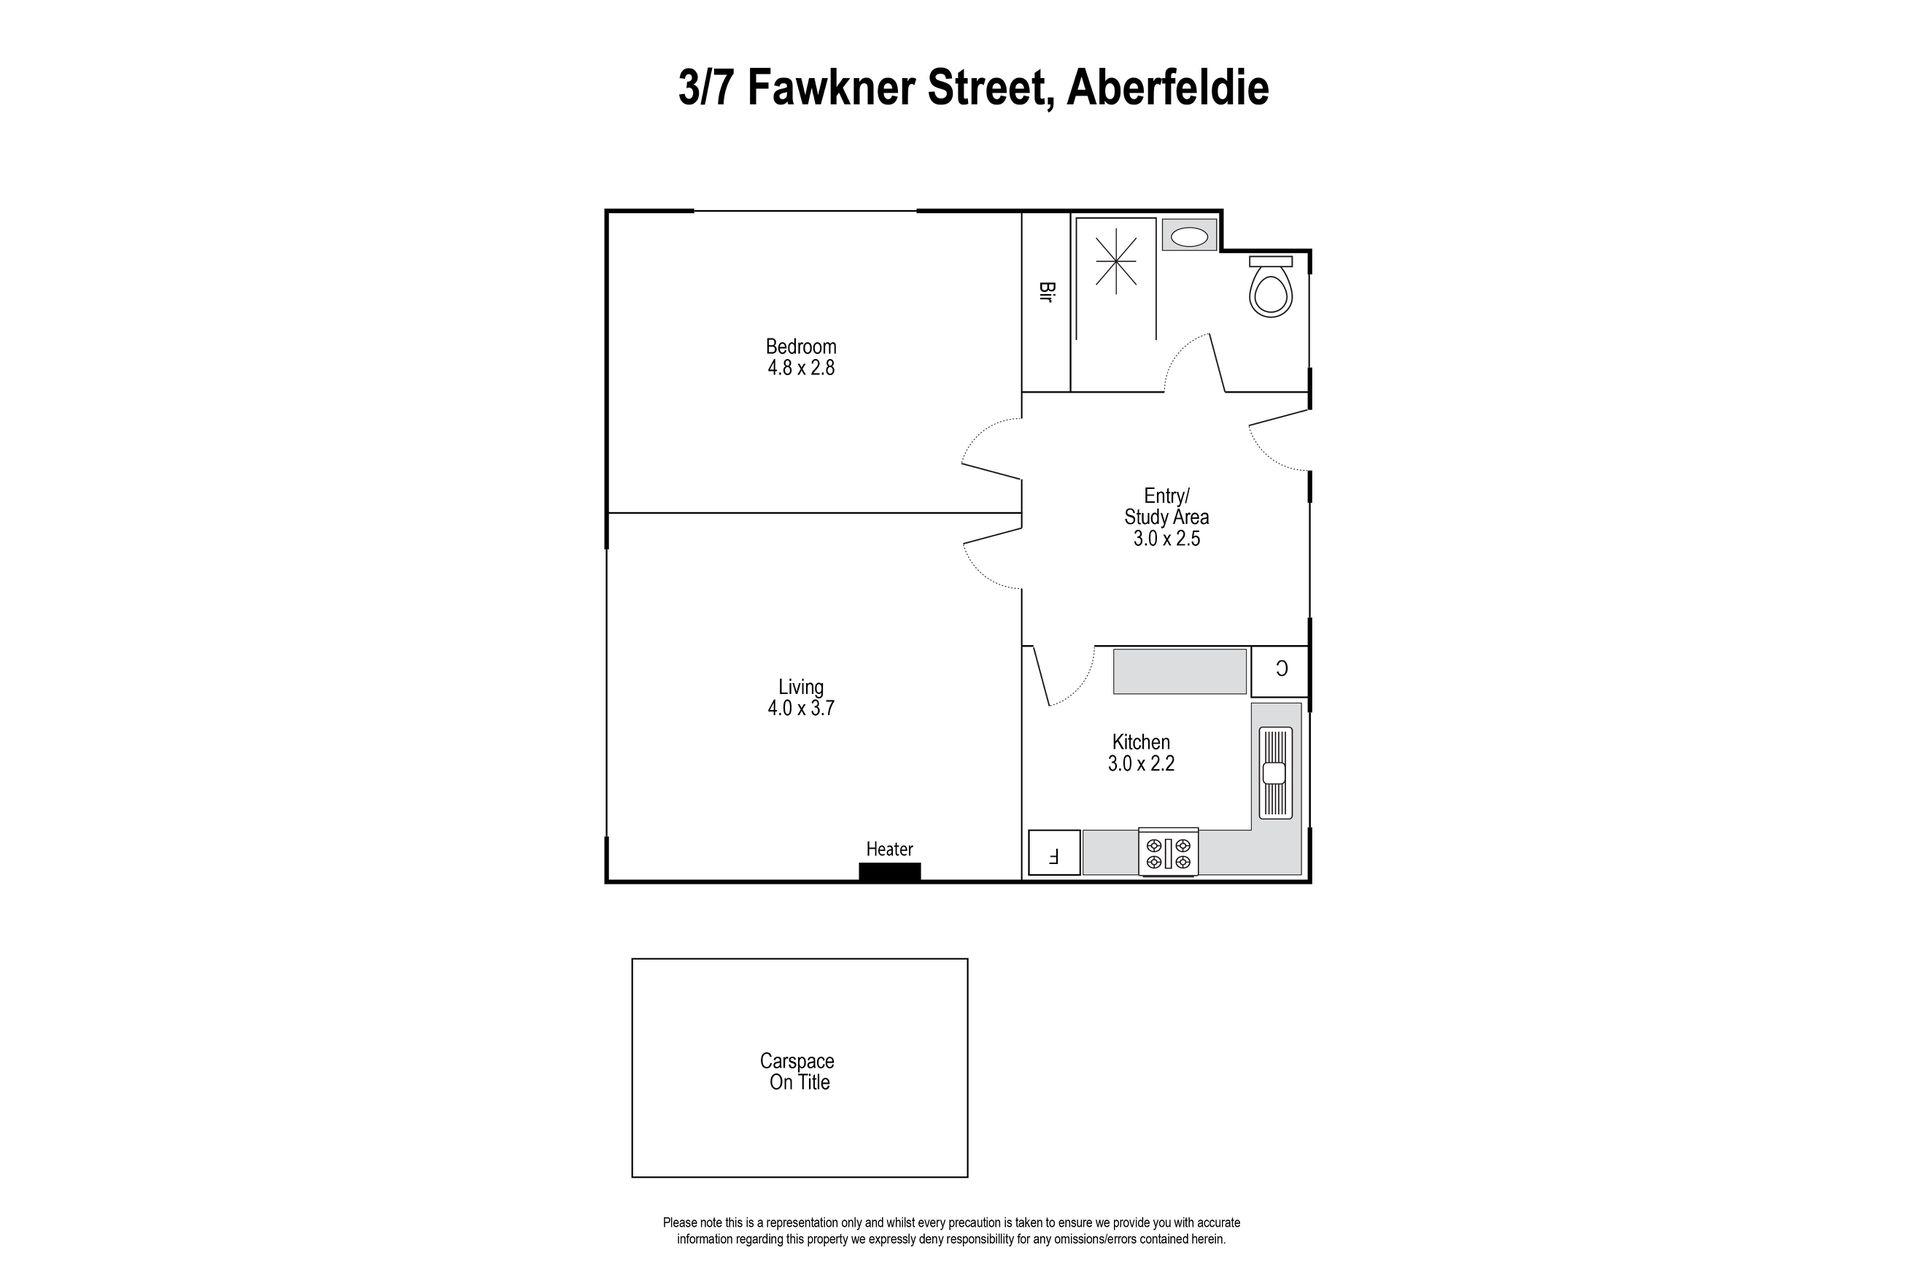 3 / 7 Fawkner Street, Aberfeldie